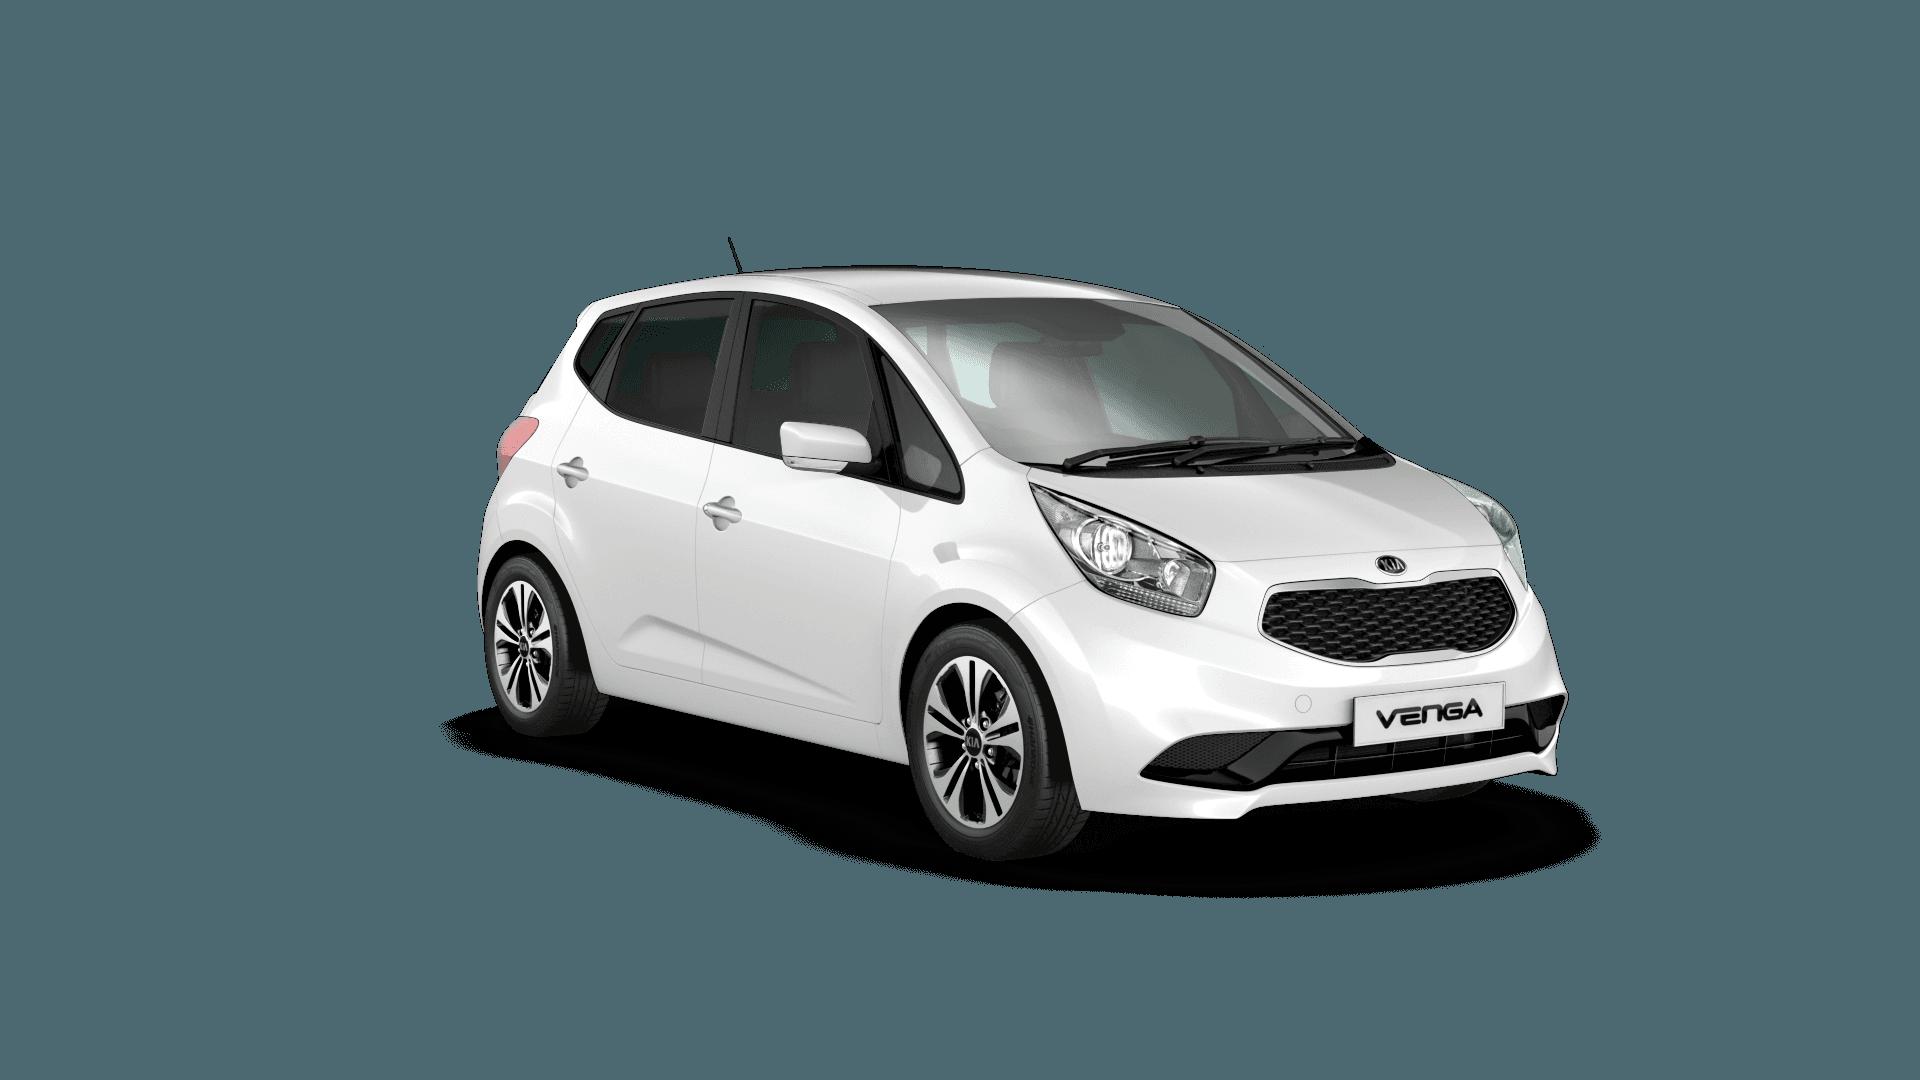 OFERTA KIA VENGA 1.4 CVVT DRIVE  PREU: 13.600'00€